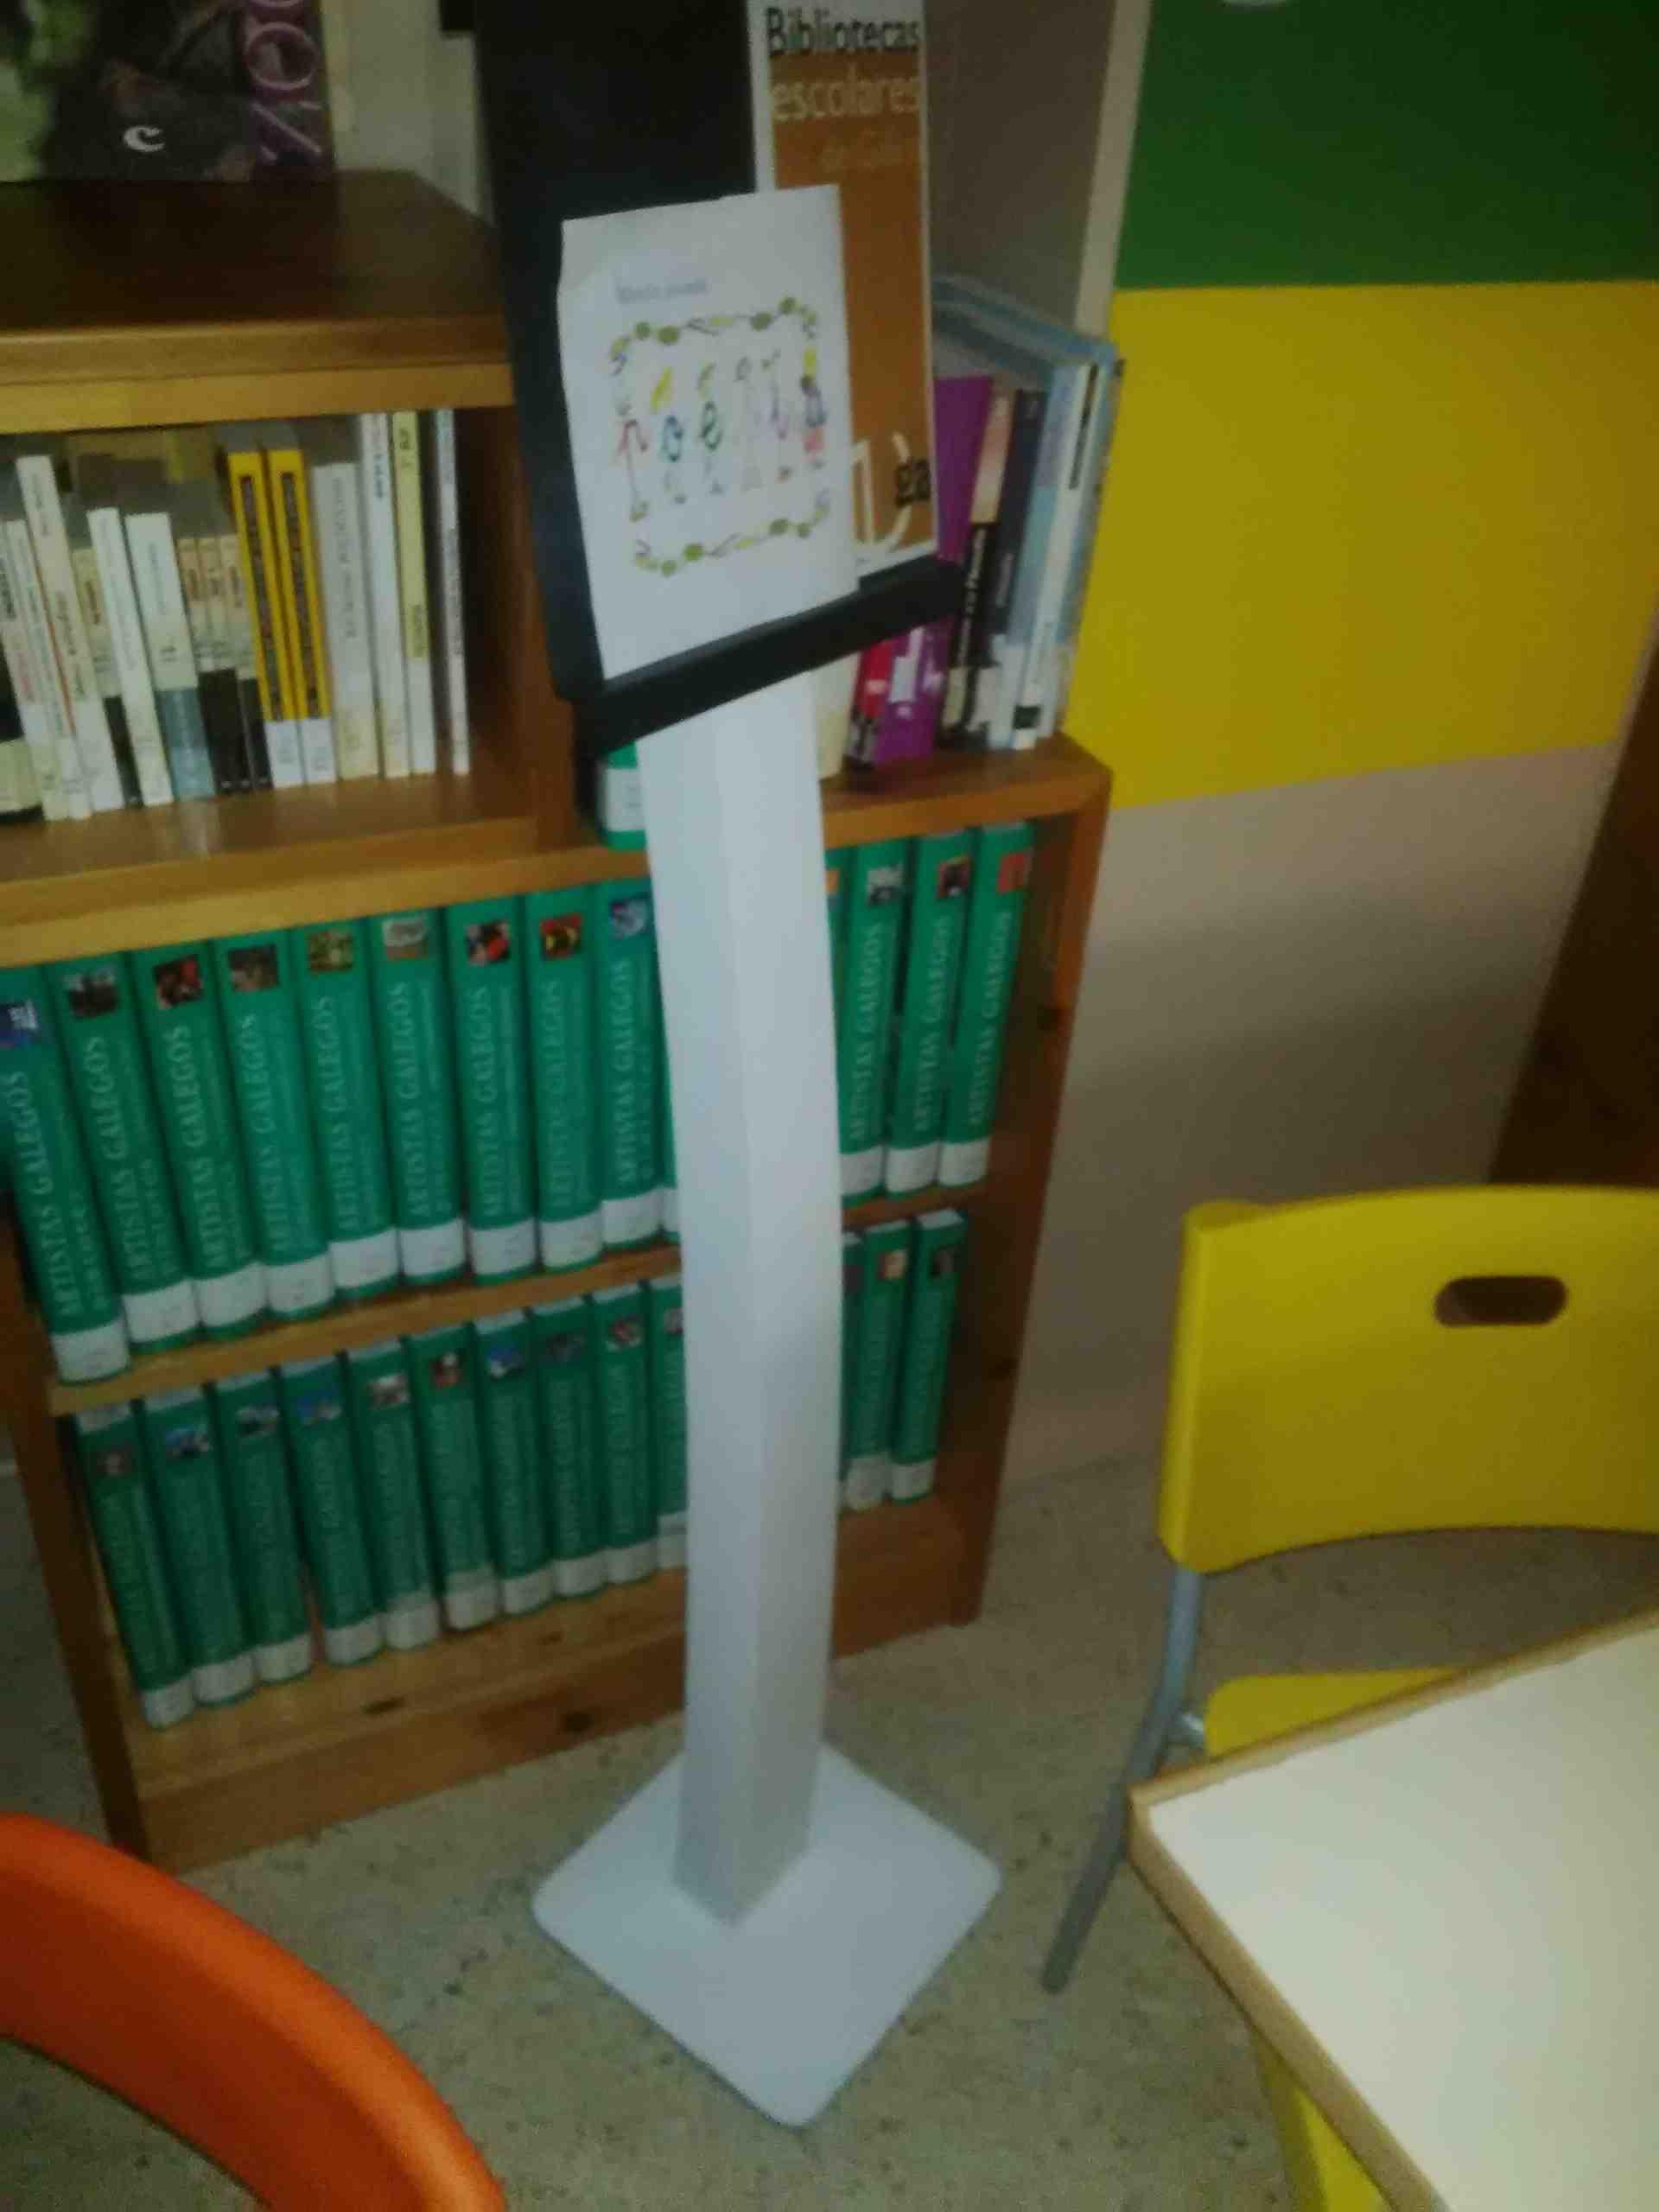 http://www.edu.xunta.gal/centros/iesjohancarballeira/?q=system/files/expositor%20biblio%203.jpg